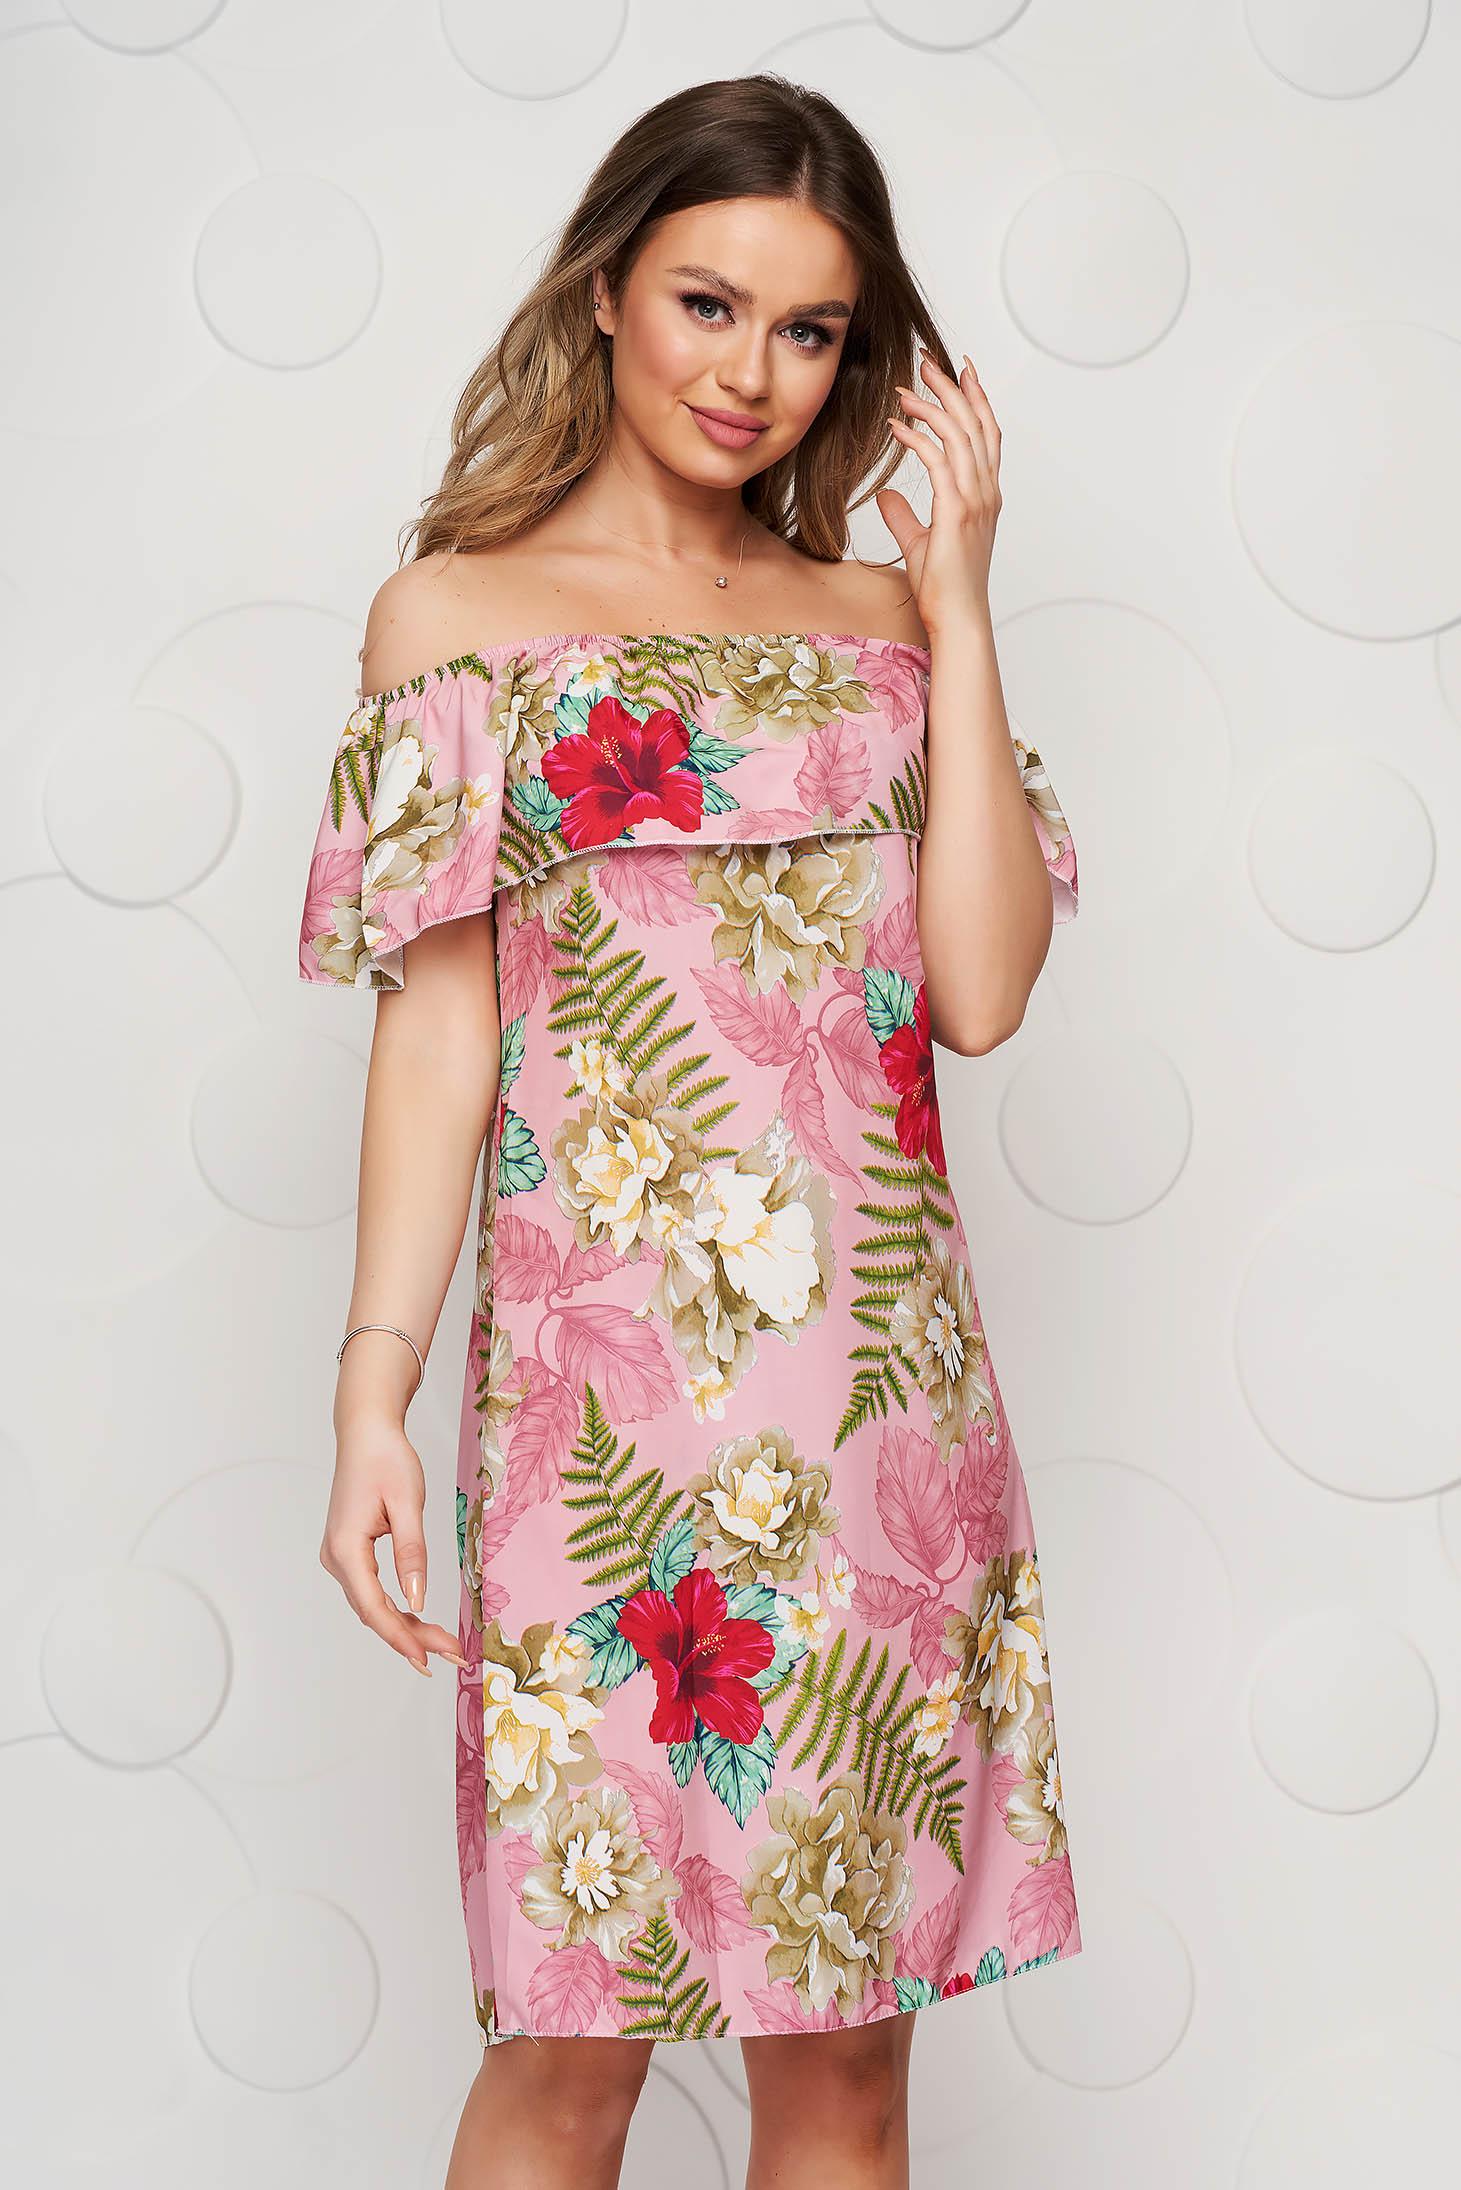 Lightpink dress short cut daily thin fabric flared off-shoulder